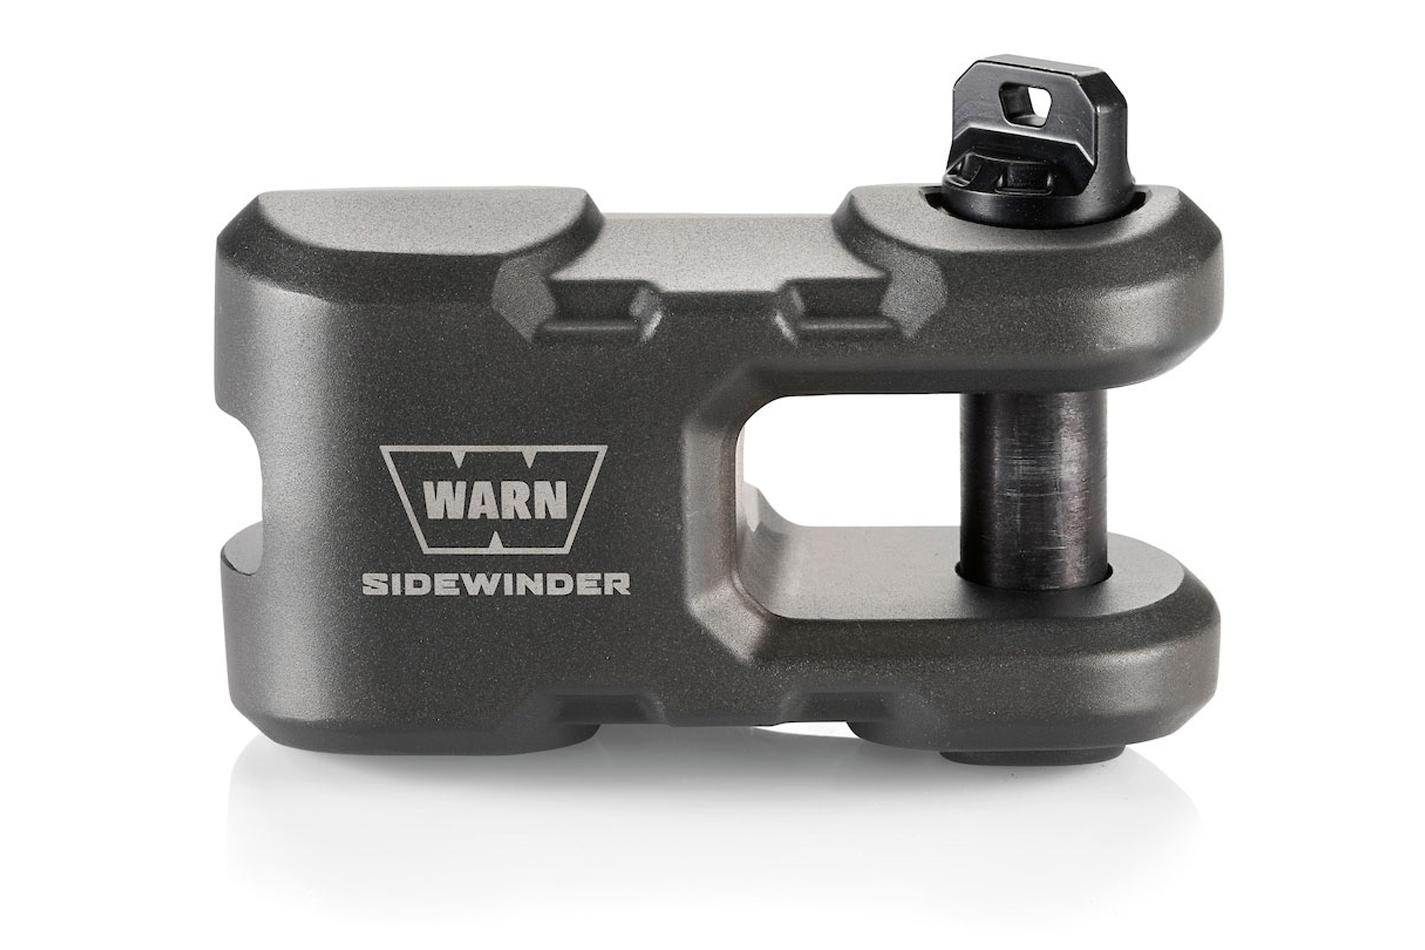 Warn Epic Sidewinder Assembly Gunmetal Finish